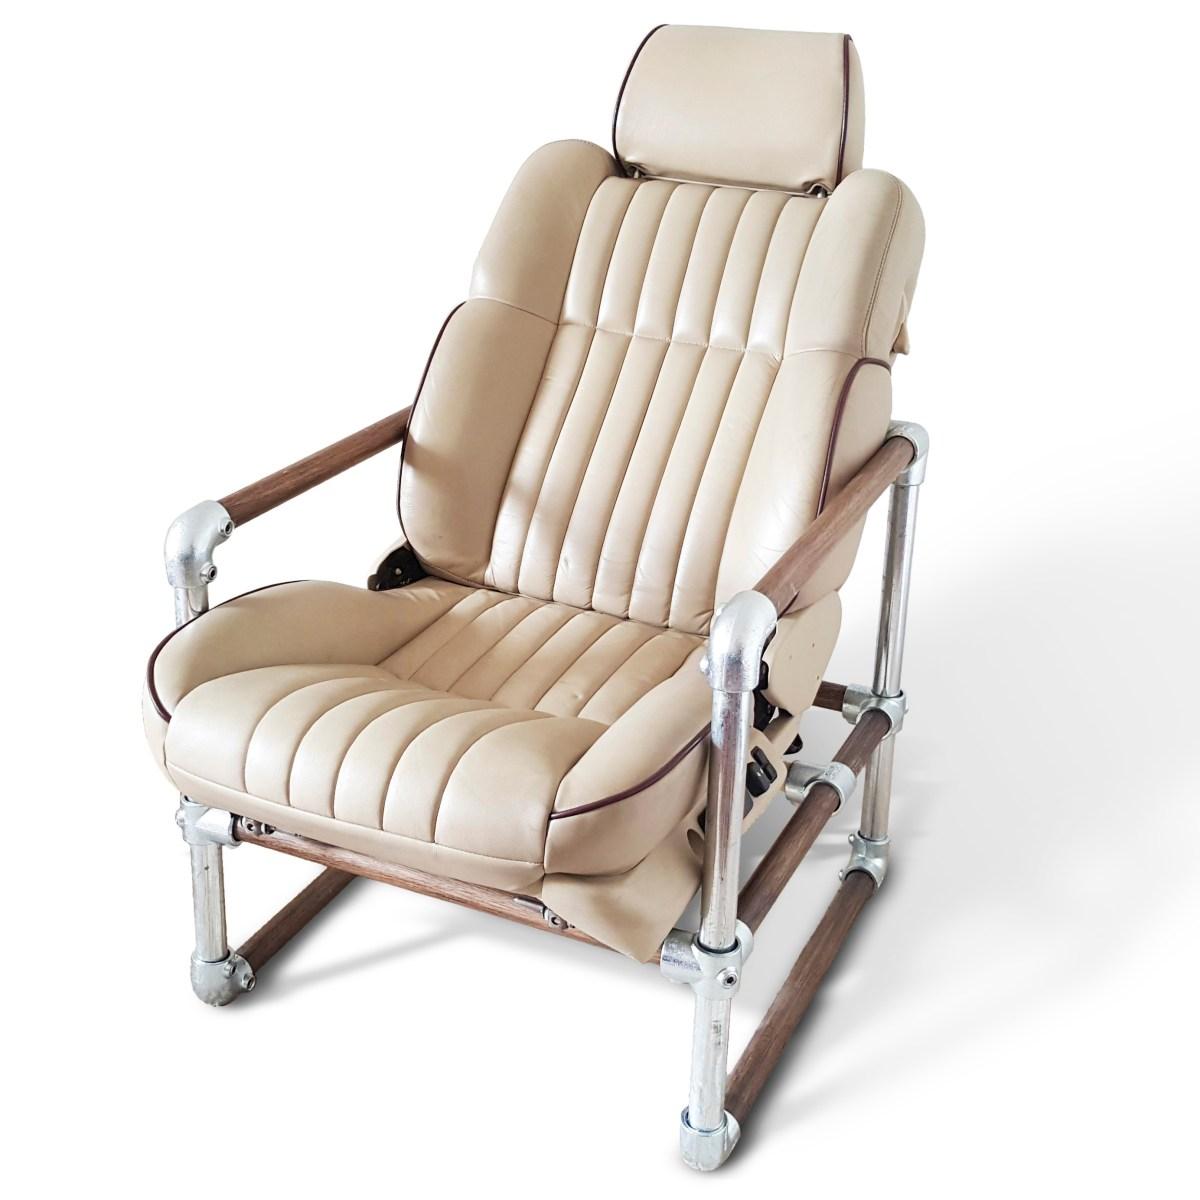 Leather Car Seat Scaffold Oak Industrial Rustic Armchair